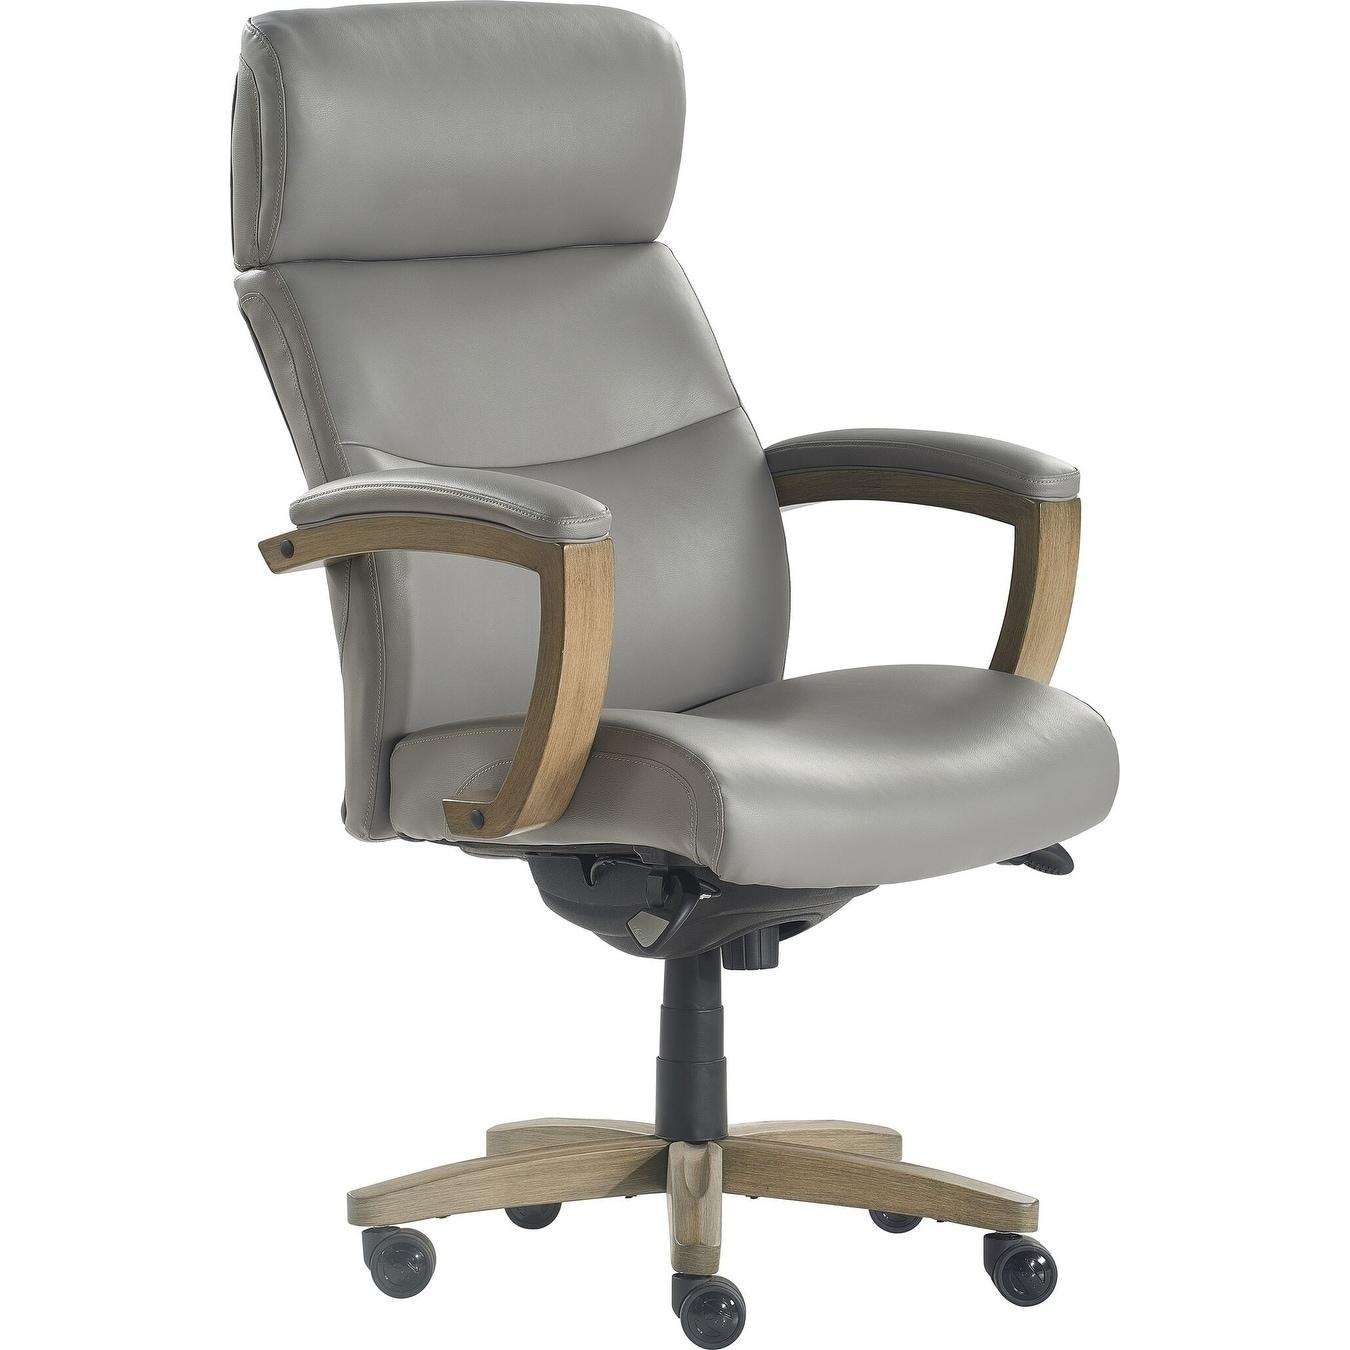 Shop La Z Boy Modern Greyson Executive Office Chair Free Shipping